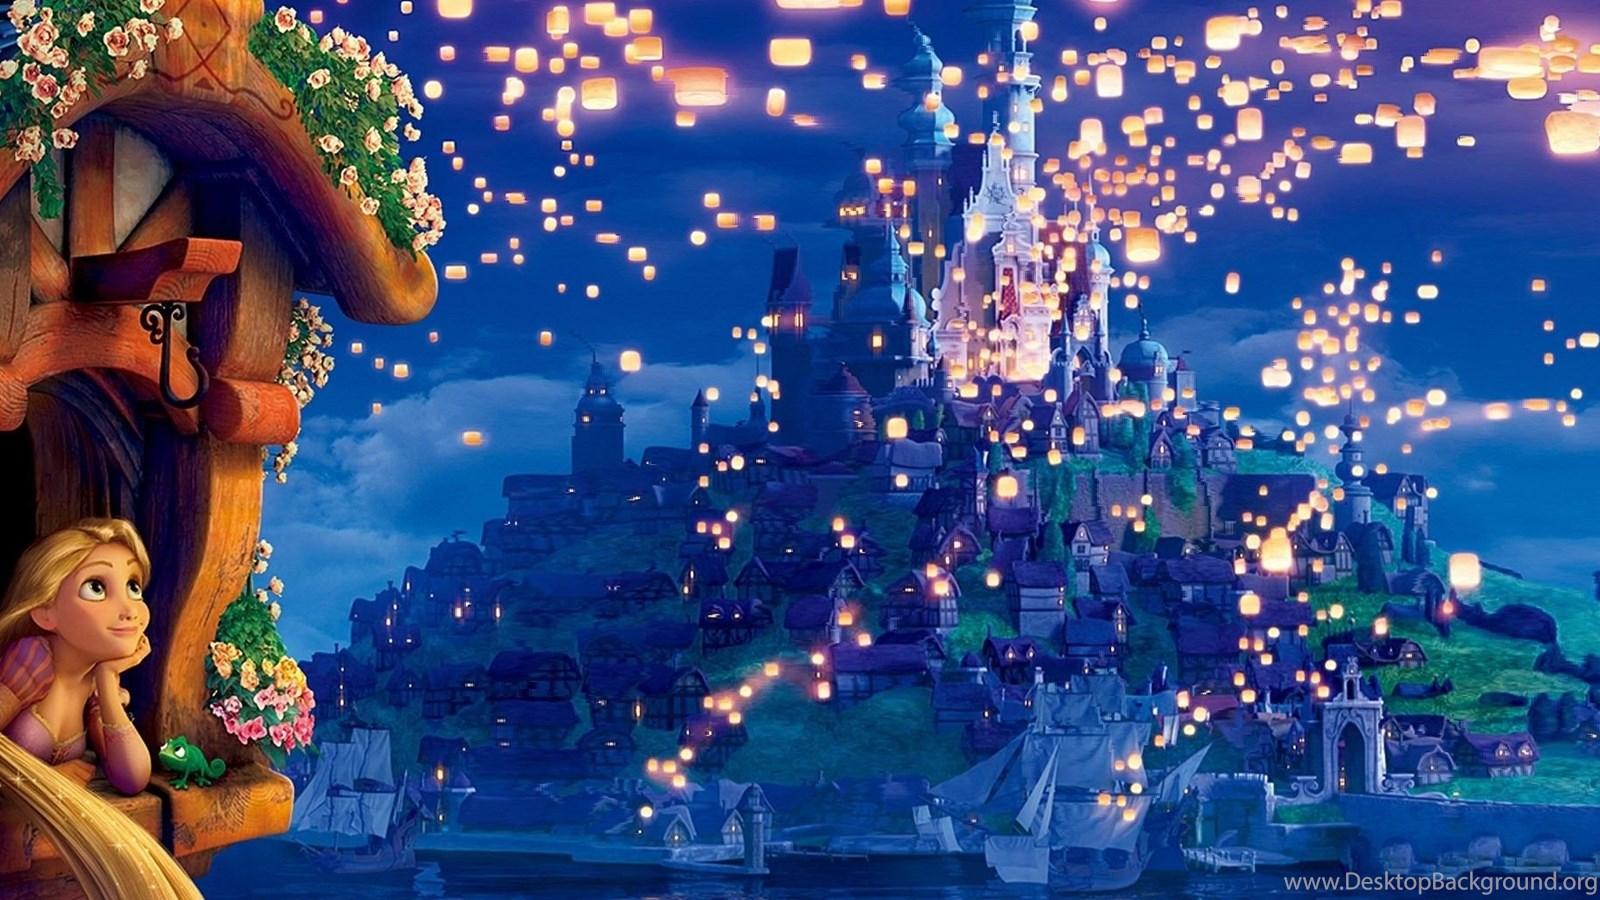 Download wallpapers tangled the movie rapunzel princess dreams desktop background - Rapunzel pictures download ...